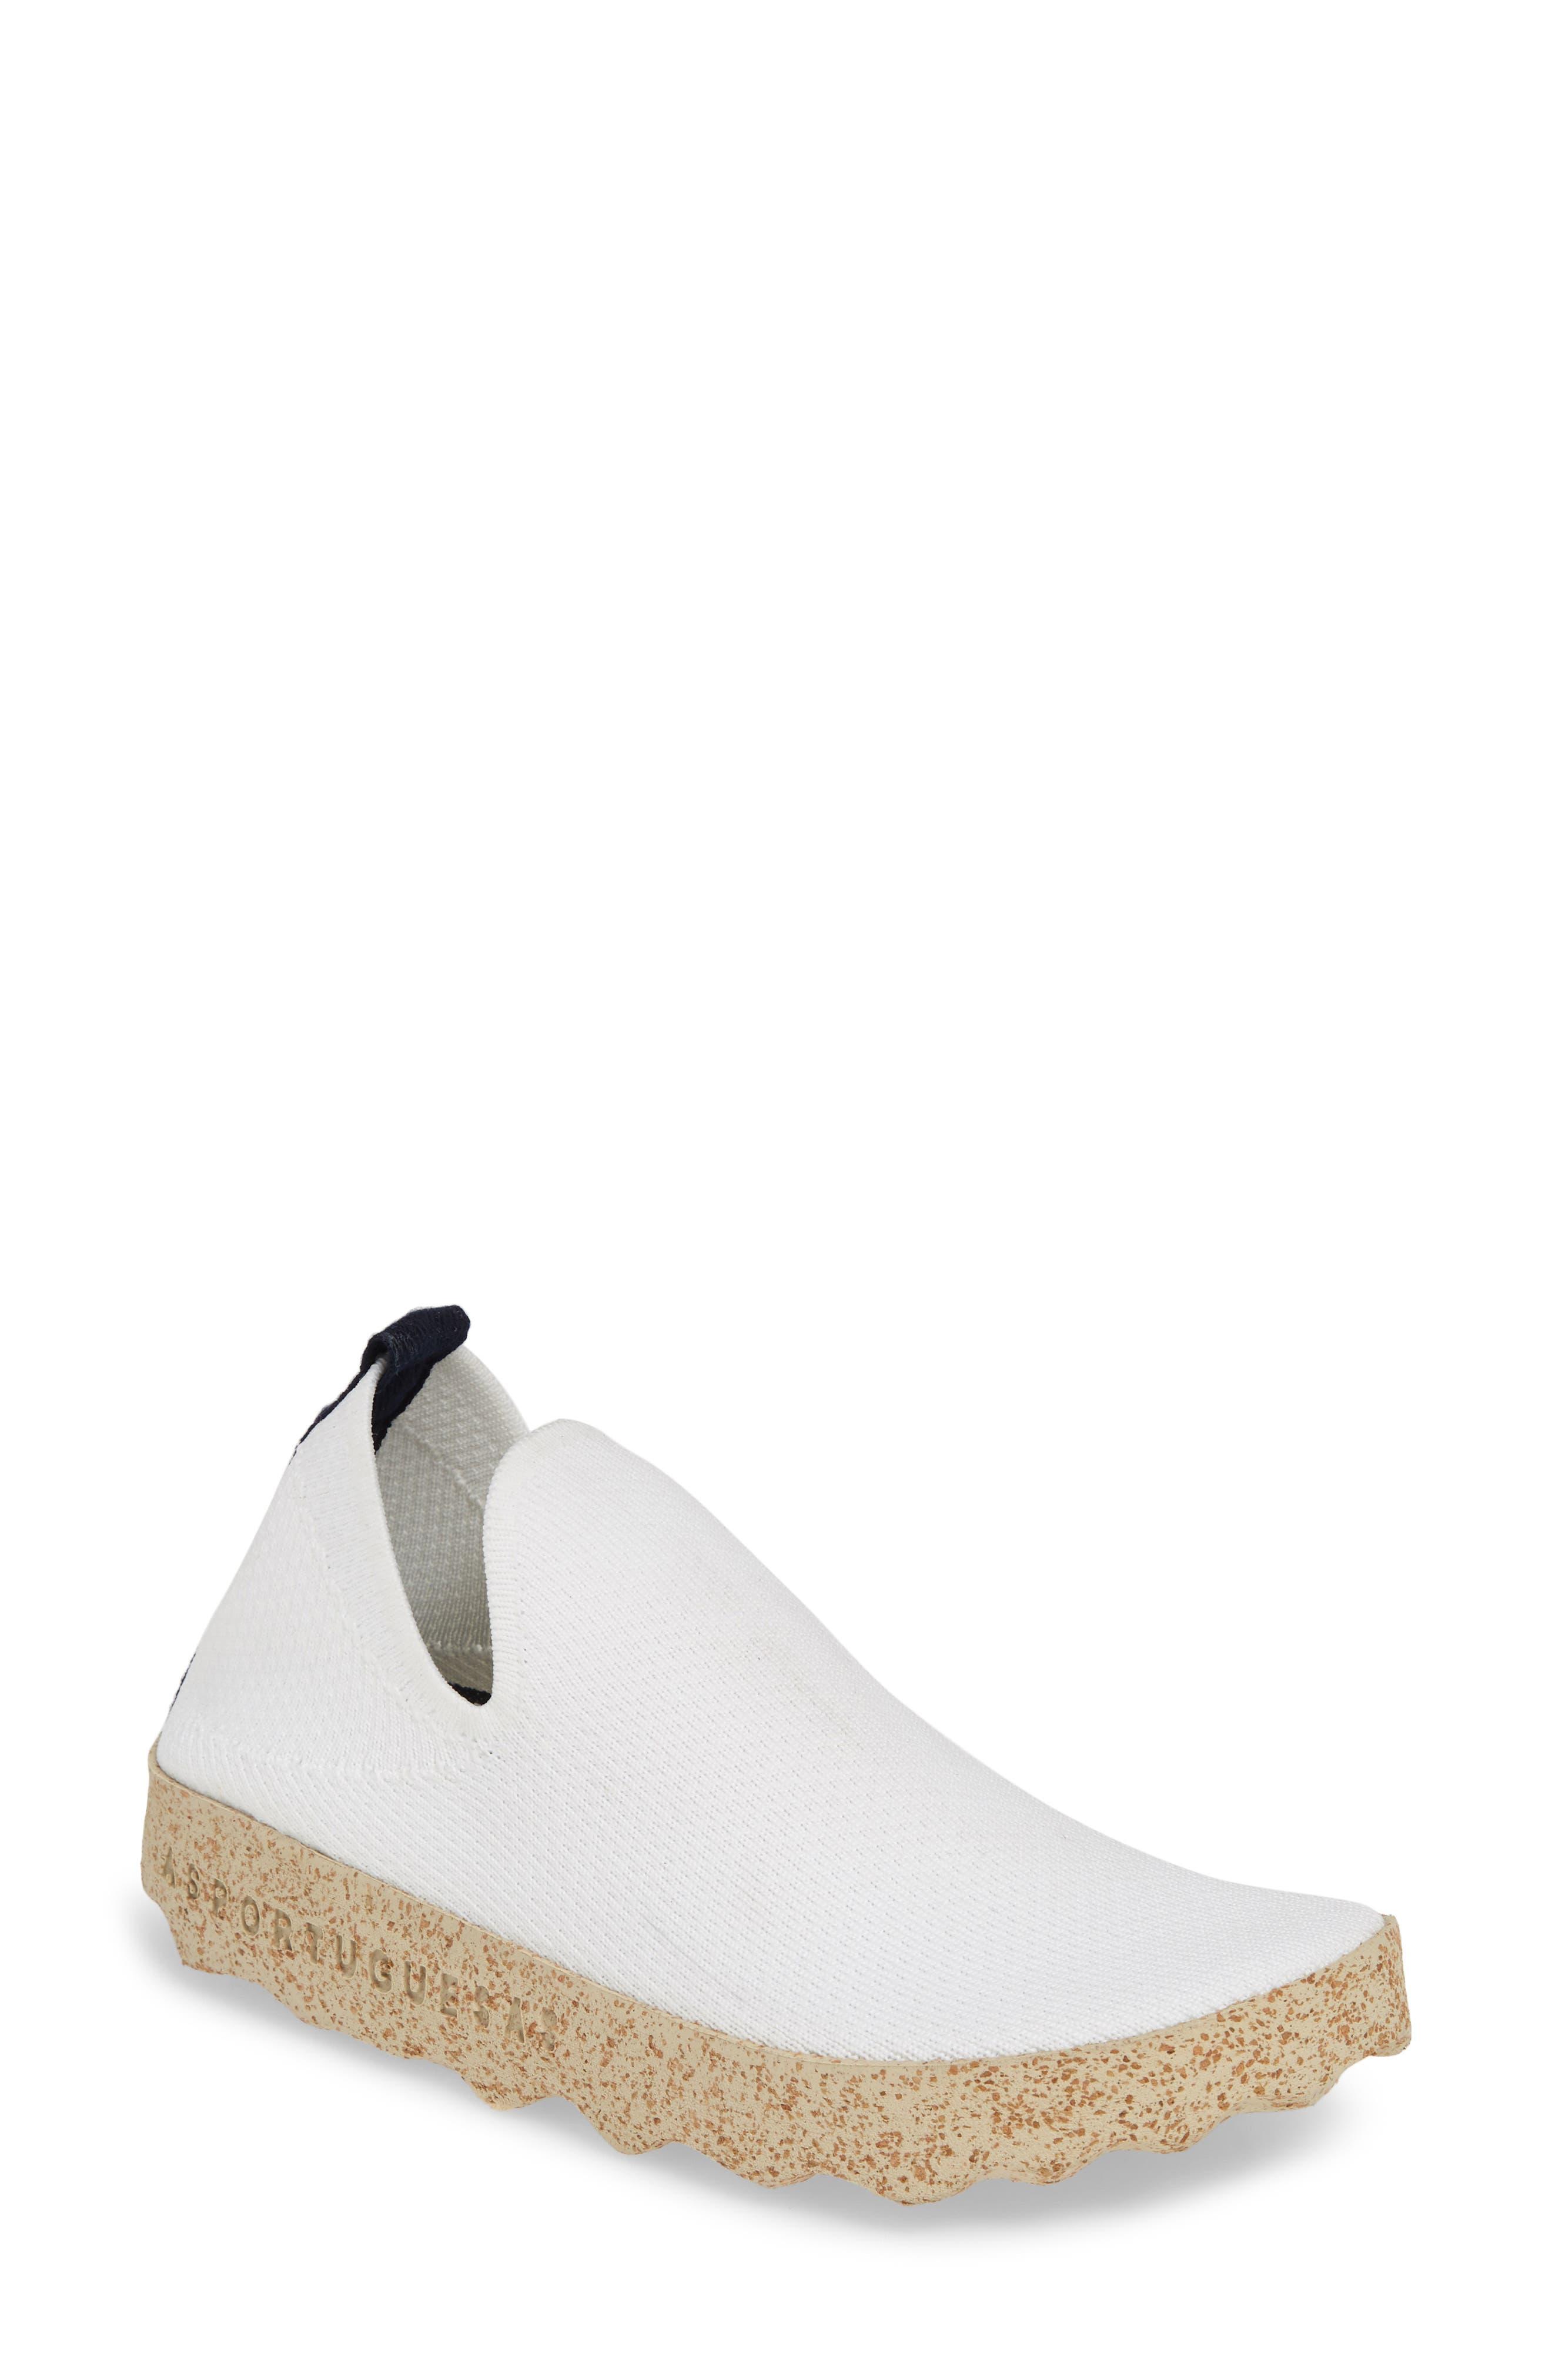 Asportuguesas By Fly London Care Sneaker, White